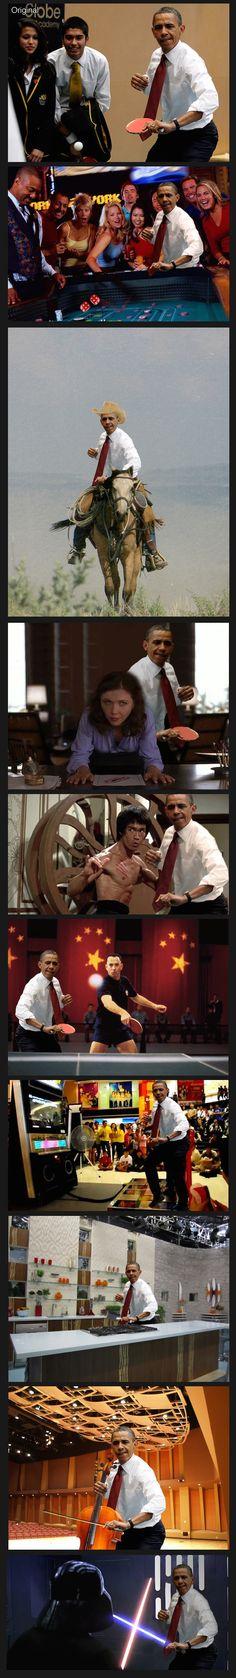 Obama playing ping pong photoshop battle